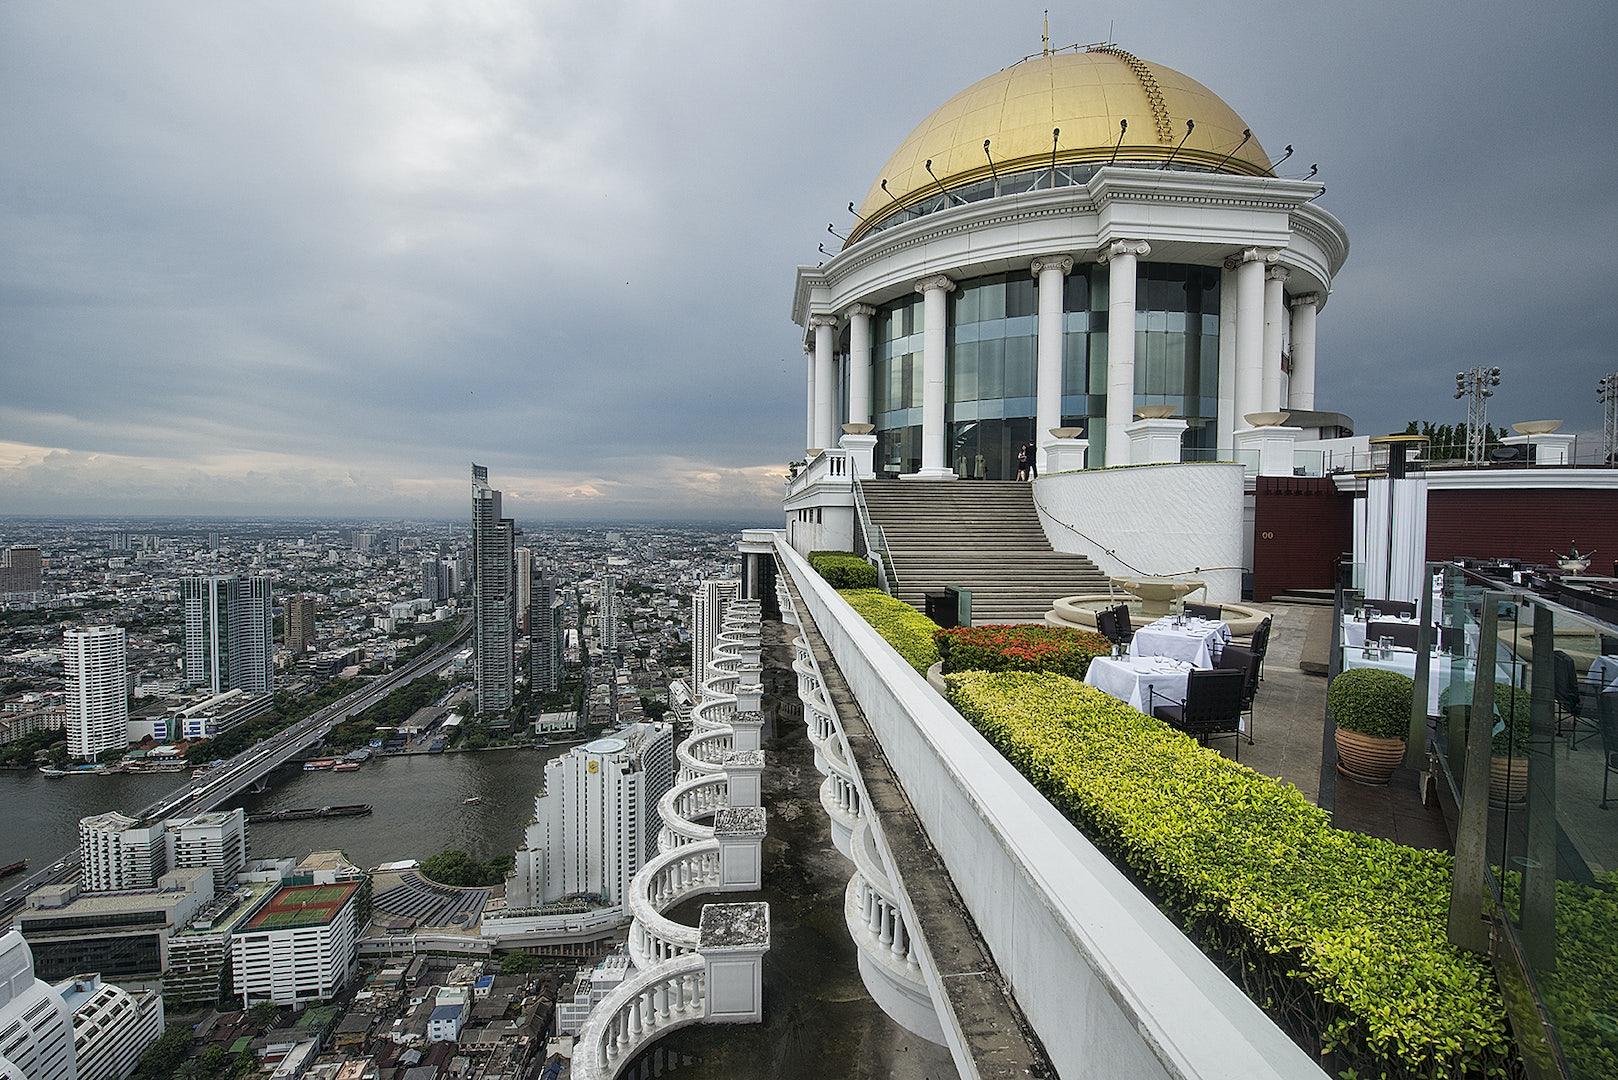 Bangkok - Skybar from The Hangover II